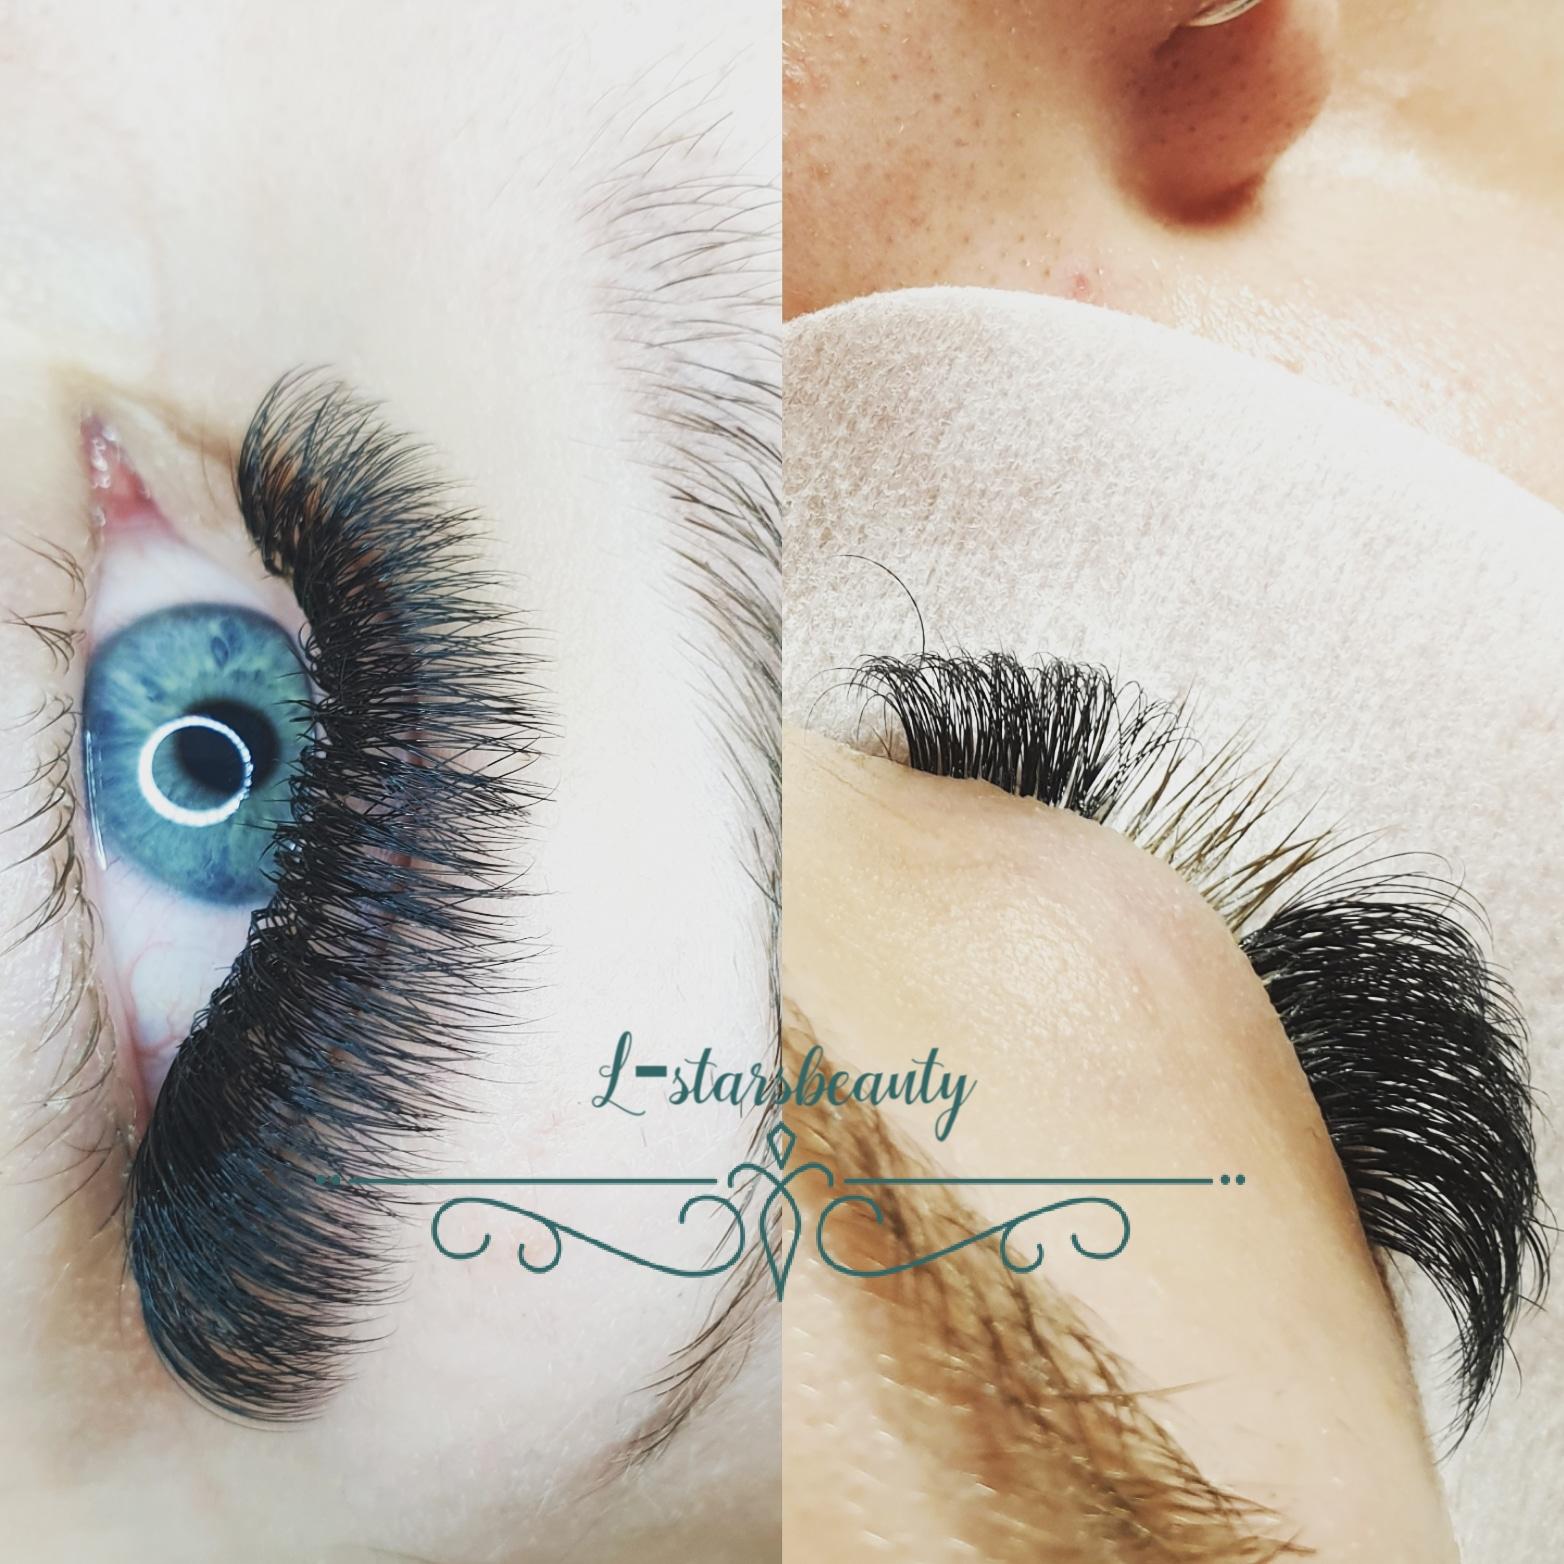 L-starsbeauty lashes by Larisa